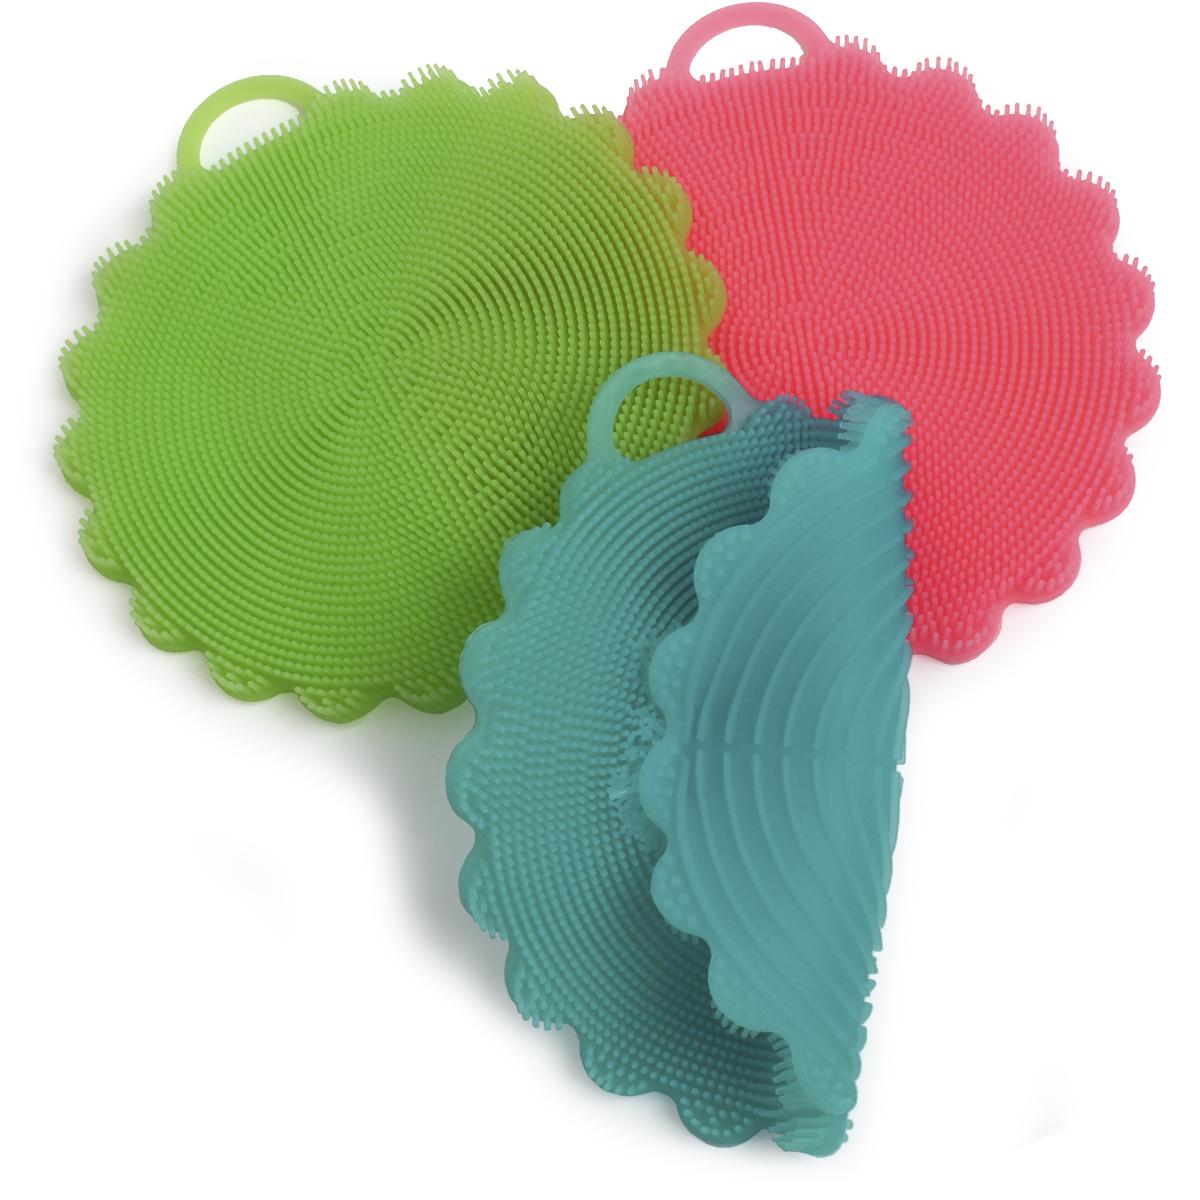 iGadgitz Home U6884 ? BPA Free Silicone Multipurpose Scrubber Sponge Brush Cloth Towel Dishes Kitchen Cleaning